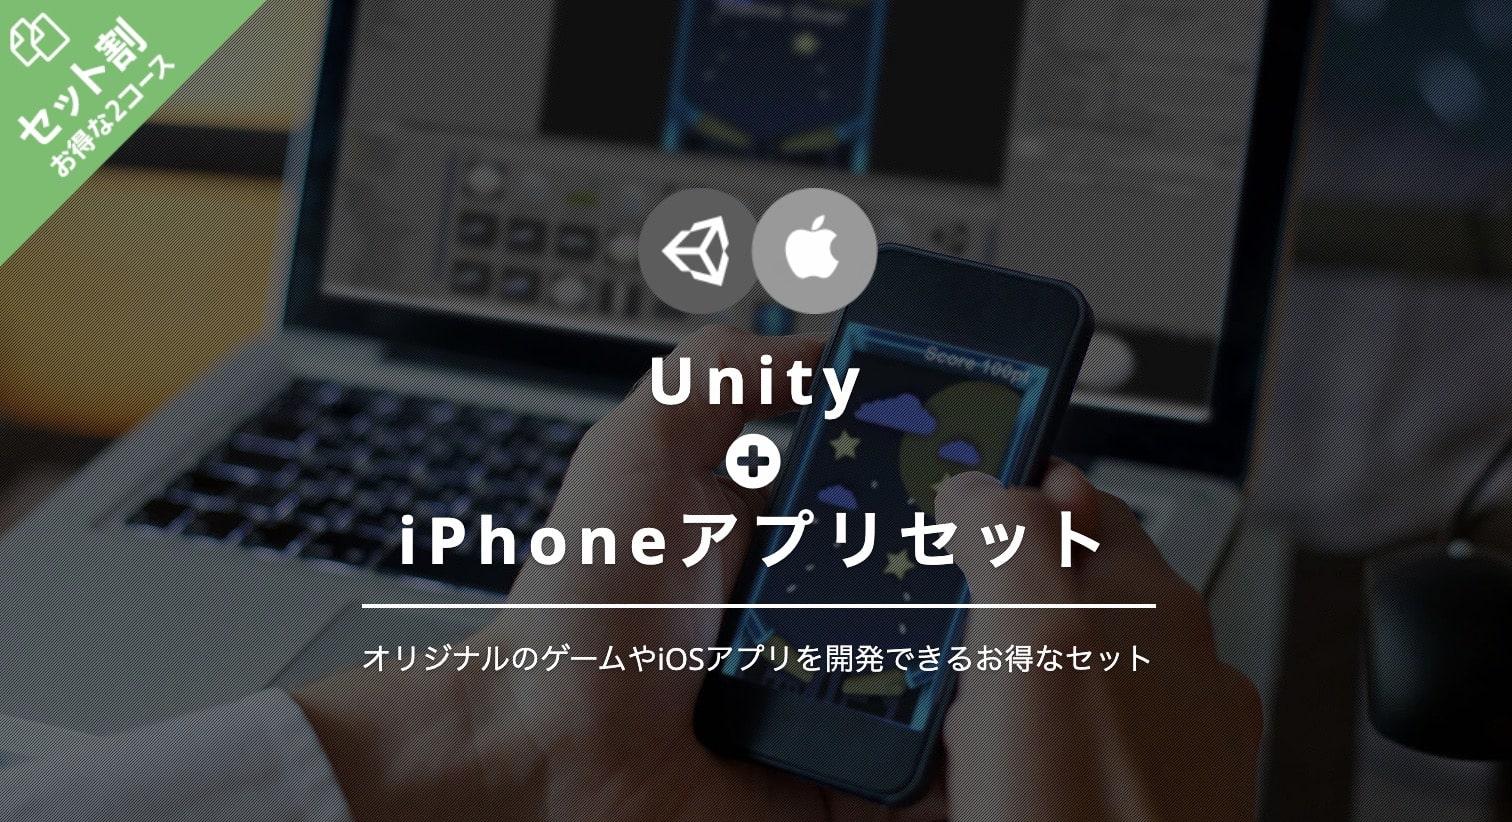 Unity+iPhoneアプリセットの料金|TechAcademy(テックアカデミー)2セット